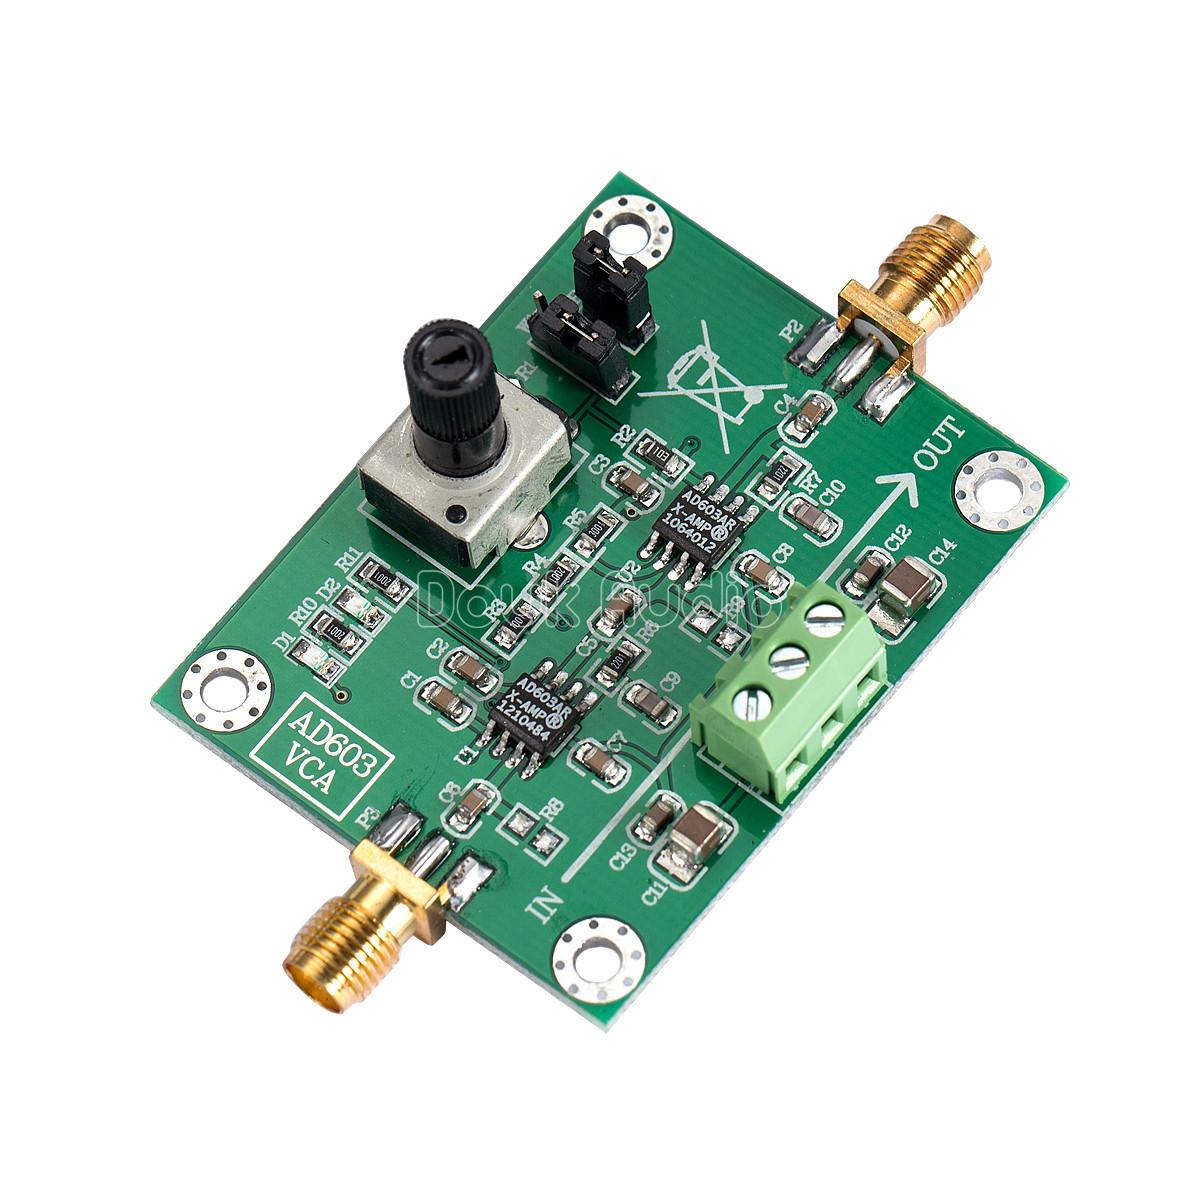 Voltage Controlled Amplifier Circuit Diagram Ssmatters Noninverting Power Tradeoficcom Ad603 Module Variable Gain Vca Control Controlcircuit